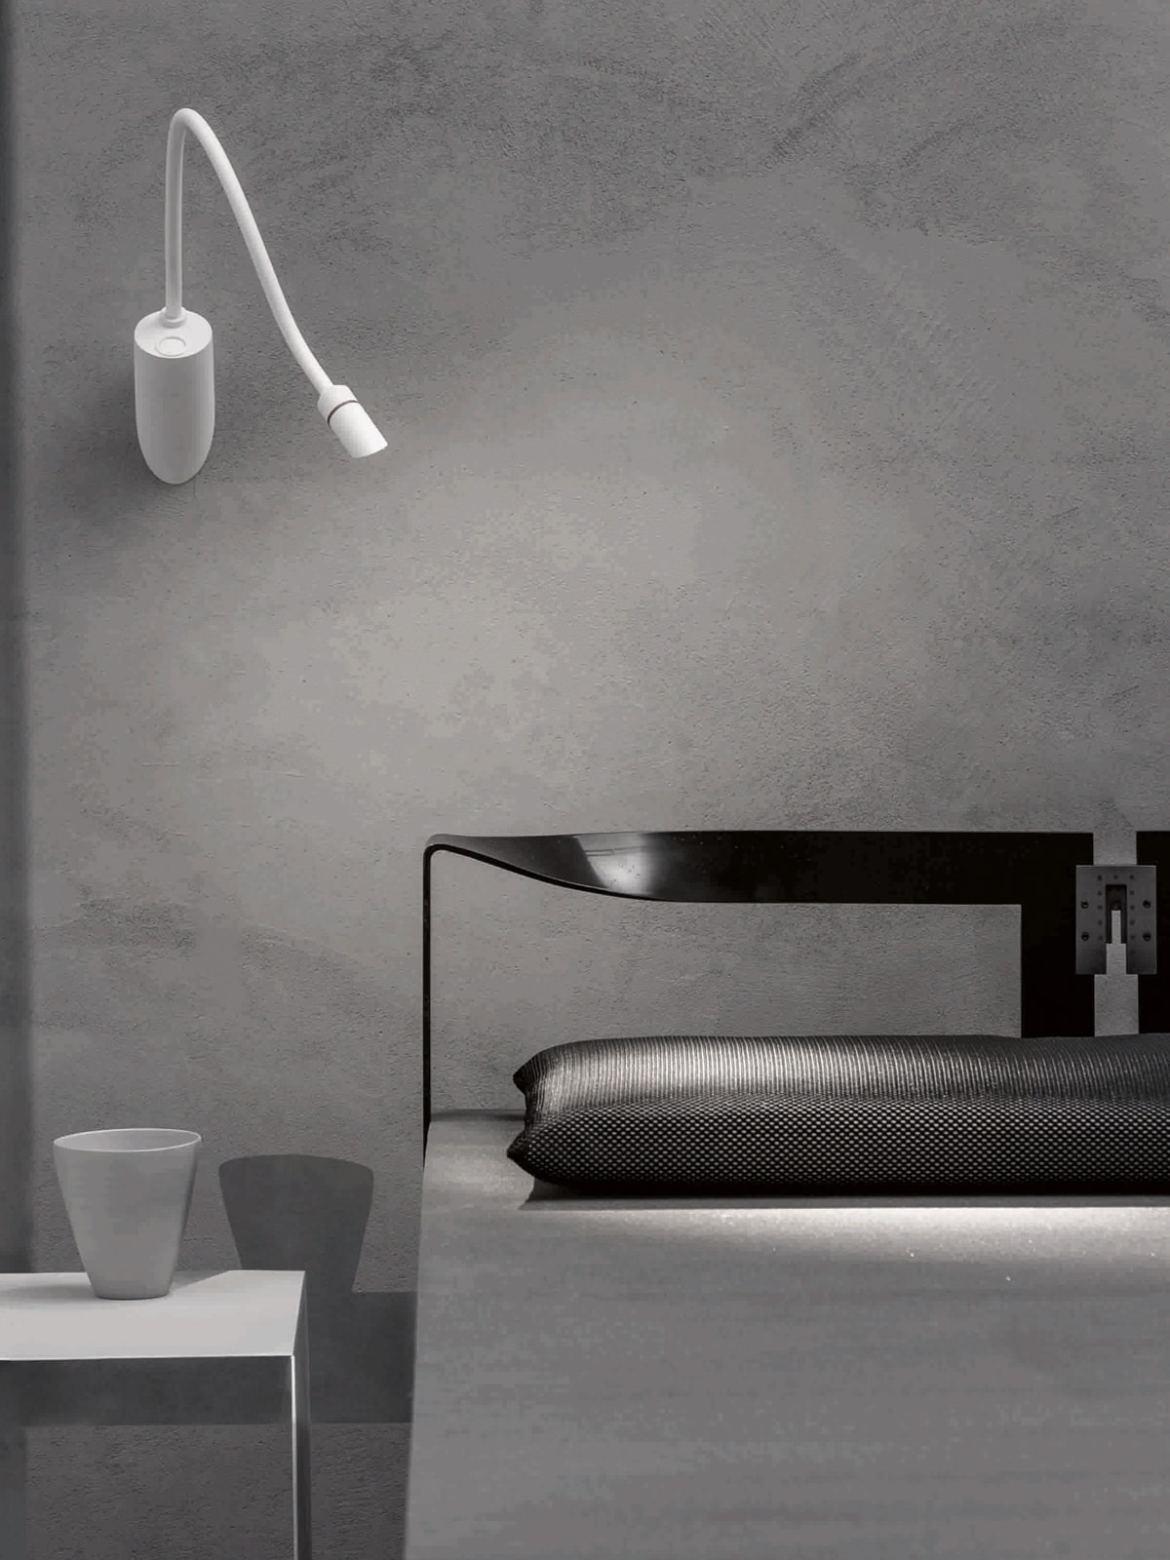 DesignOrt Lampen Blog: Bettleuchten X Mal Anders LED Wandlampe led it be Lumini